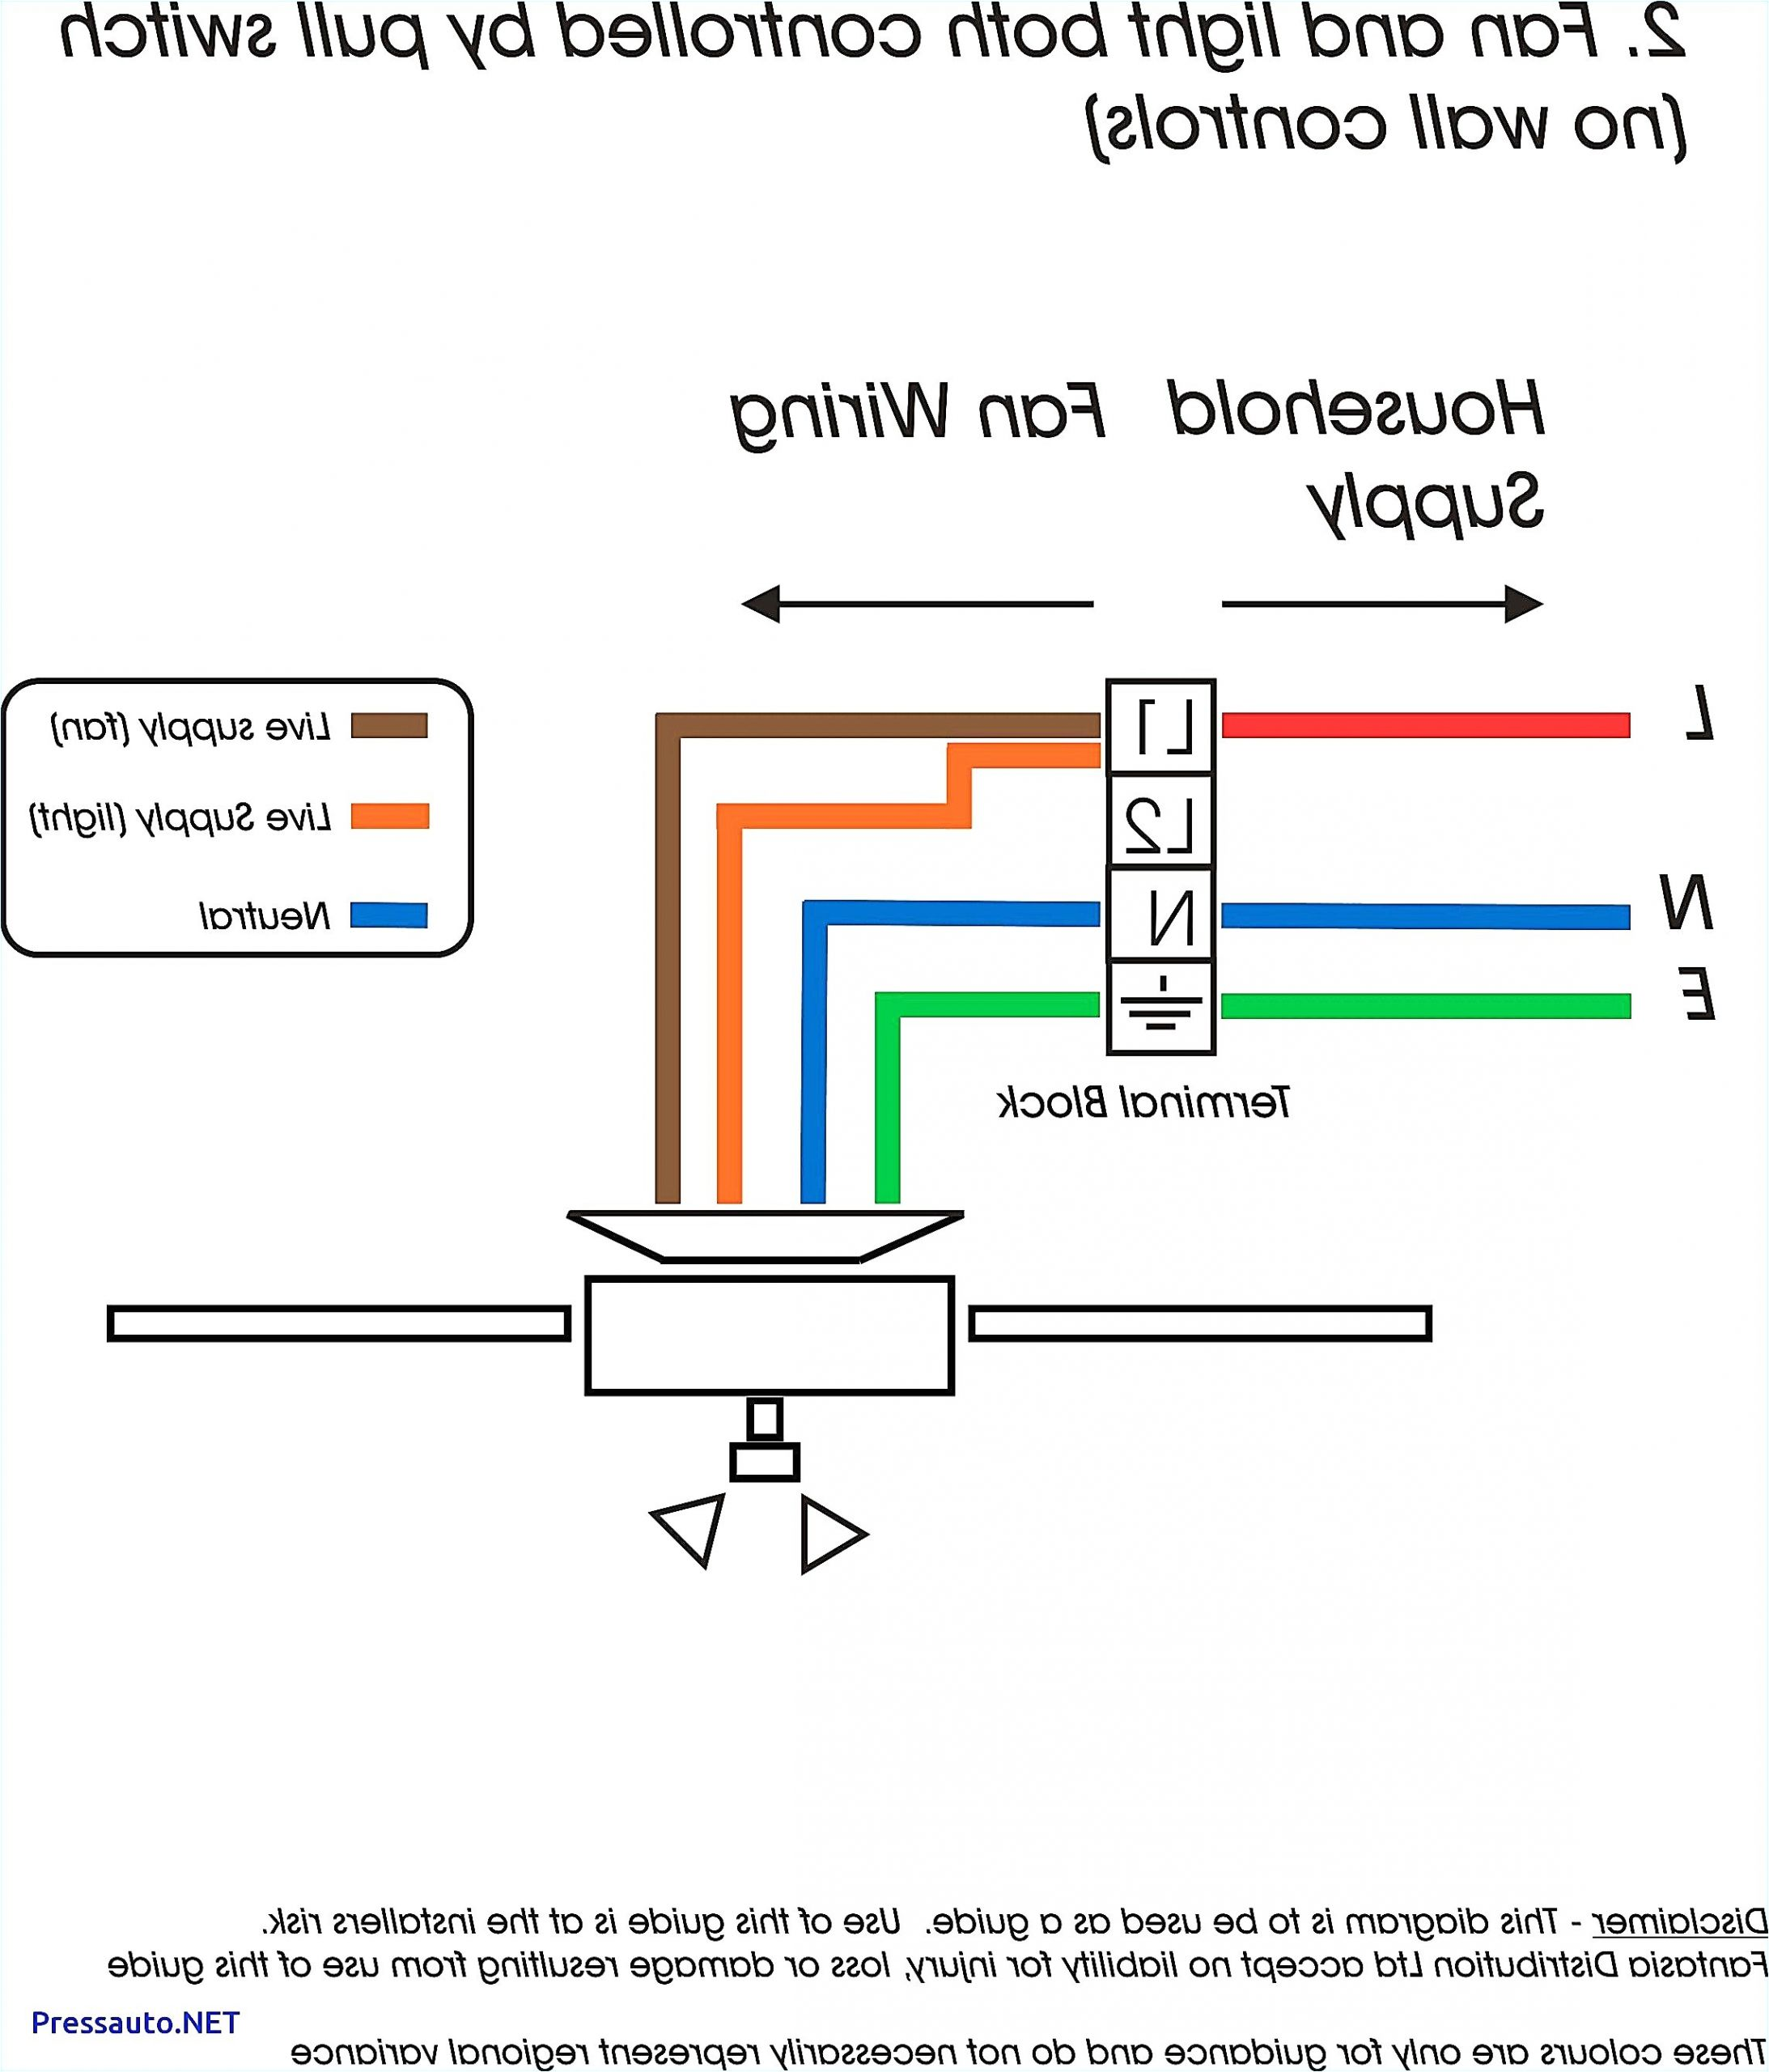 g35 bose amp wiring diagram unique bose amplifier wiring diagram easelaub wiring diagram collection of g35 bose amp wiring diagram jpg